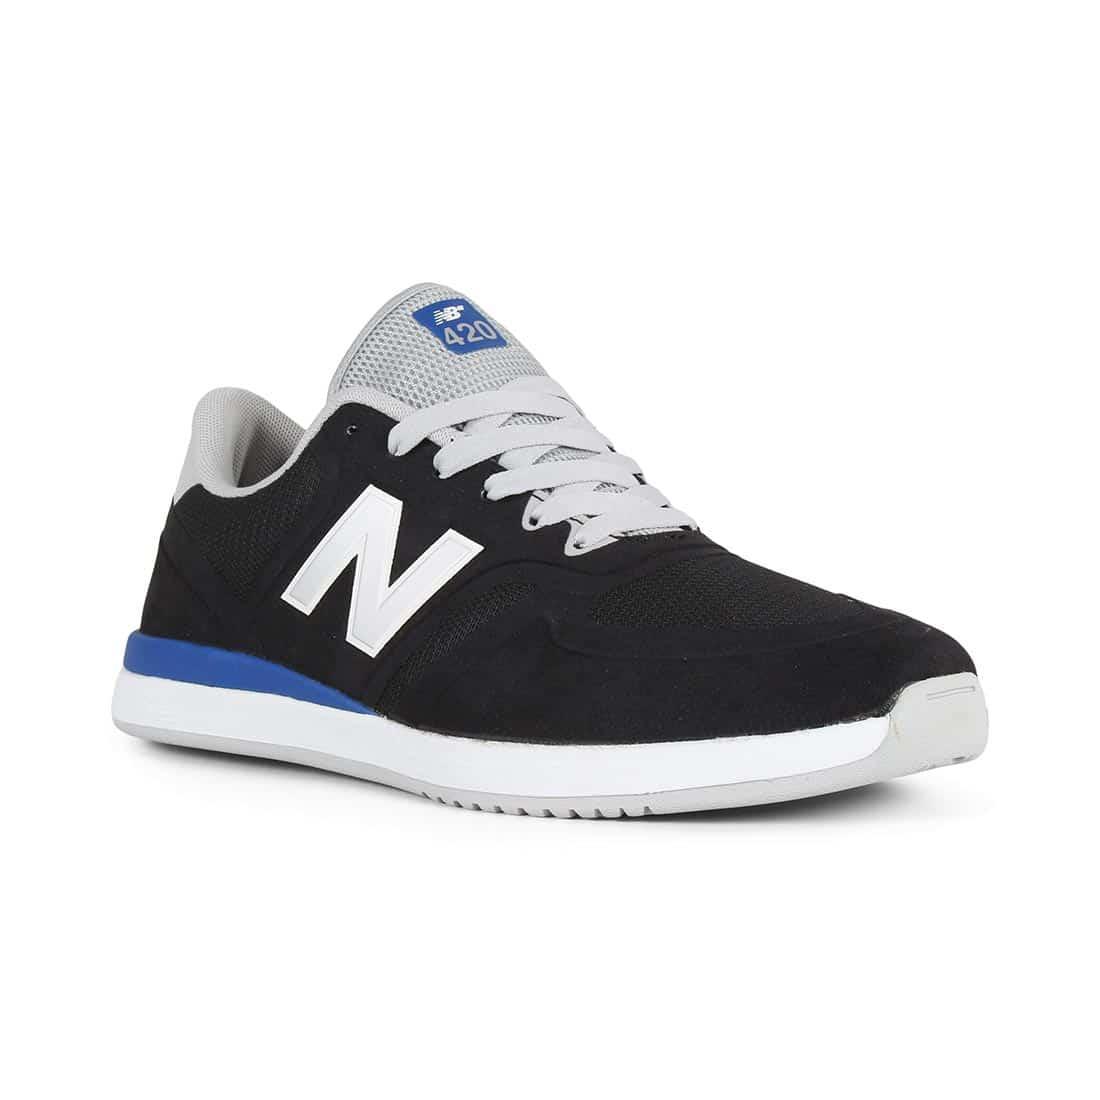 New Balance Numeric 420 Shoes – Black / Royal Blue